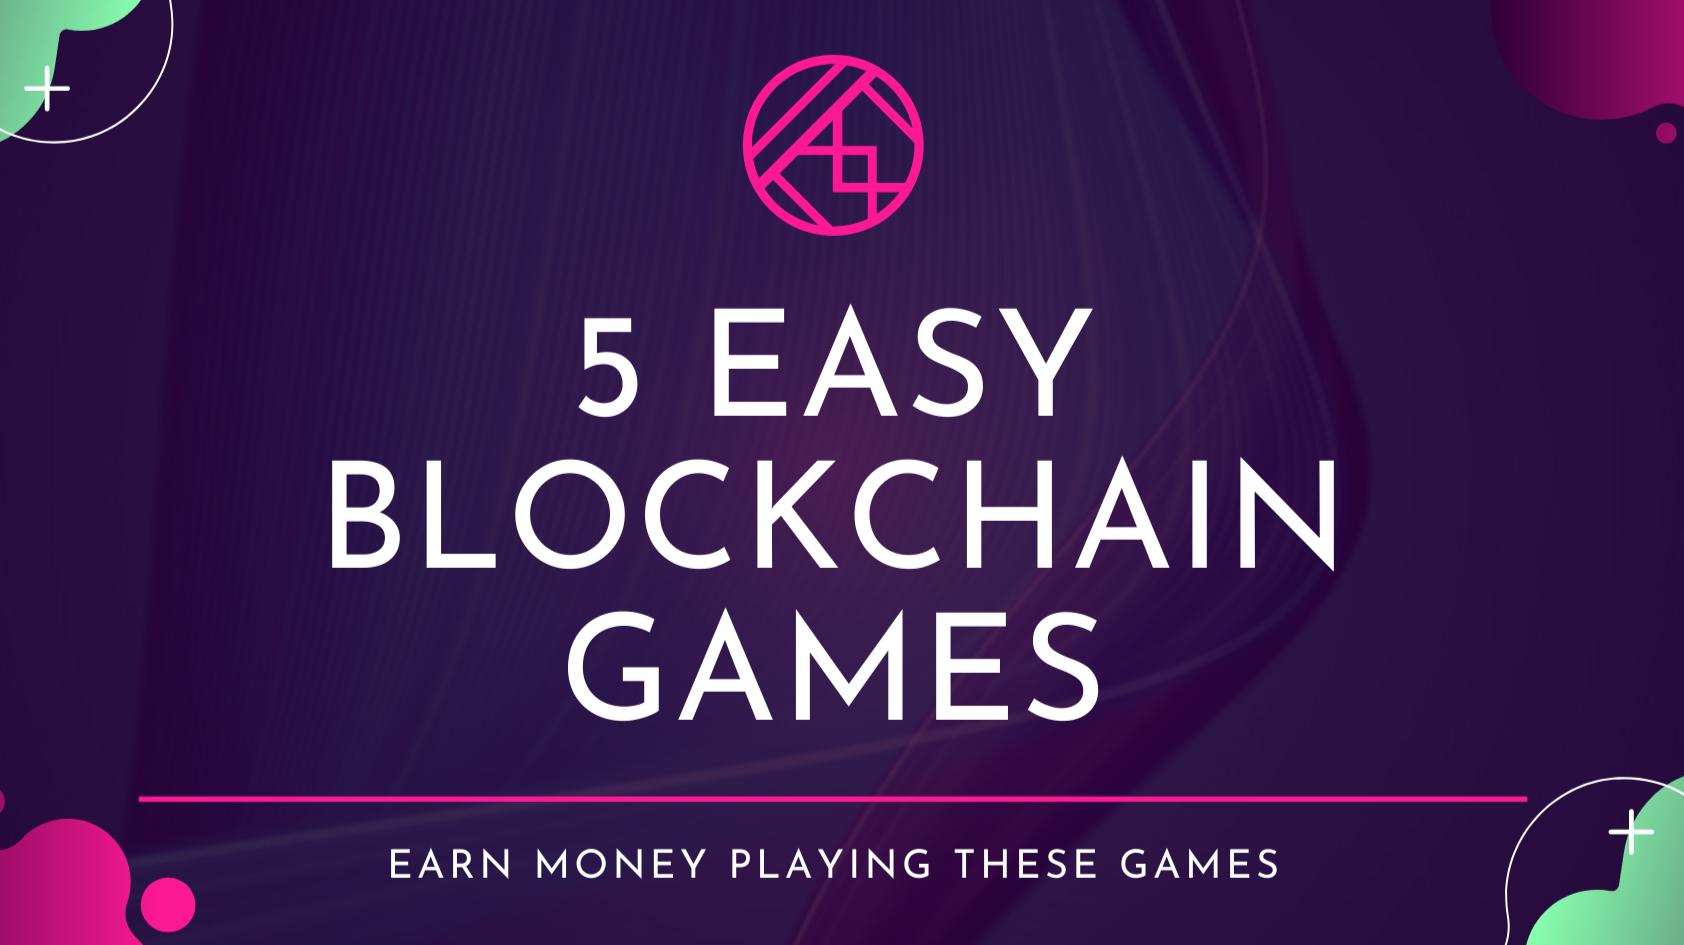 4 Easy Blockchain Games